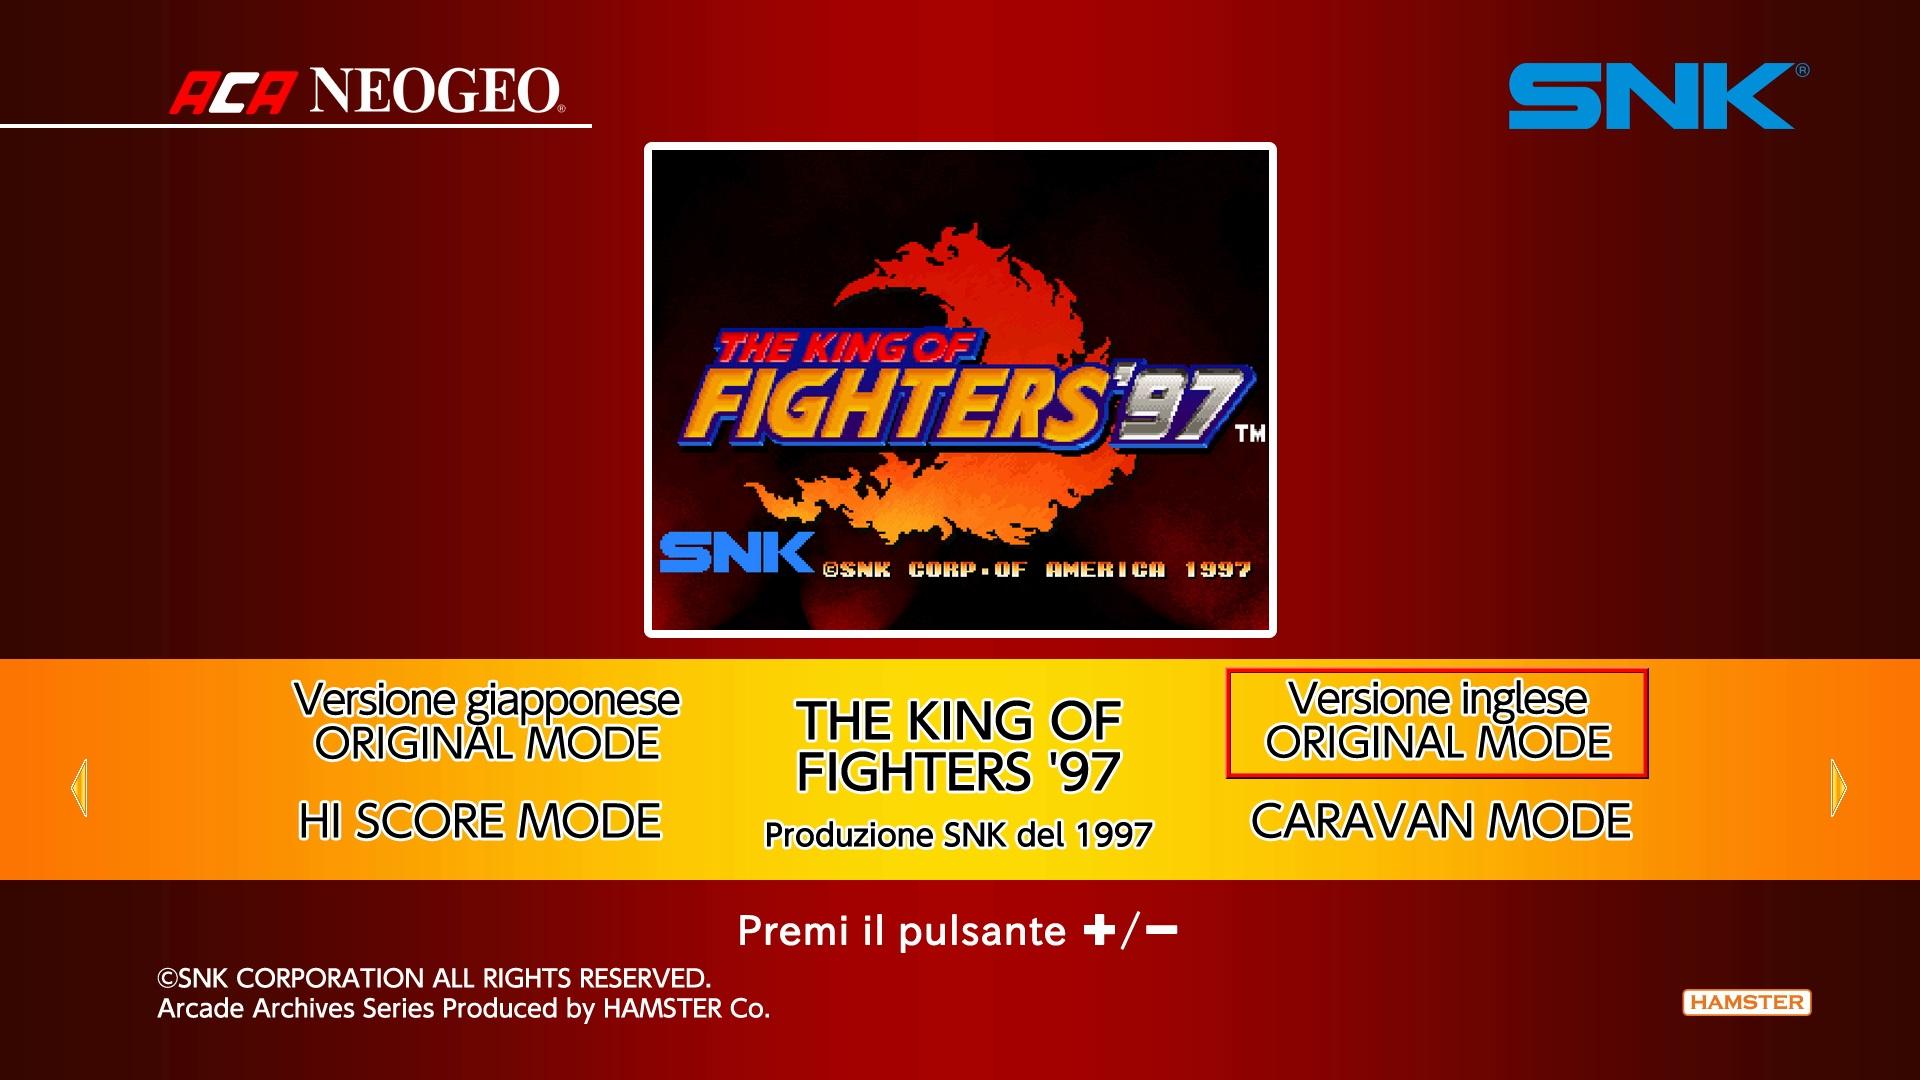 Aca Neogeo The King Of Fighters 97 Uno Sguardo In Video Al